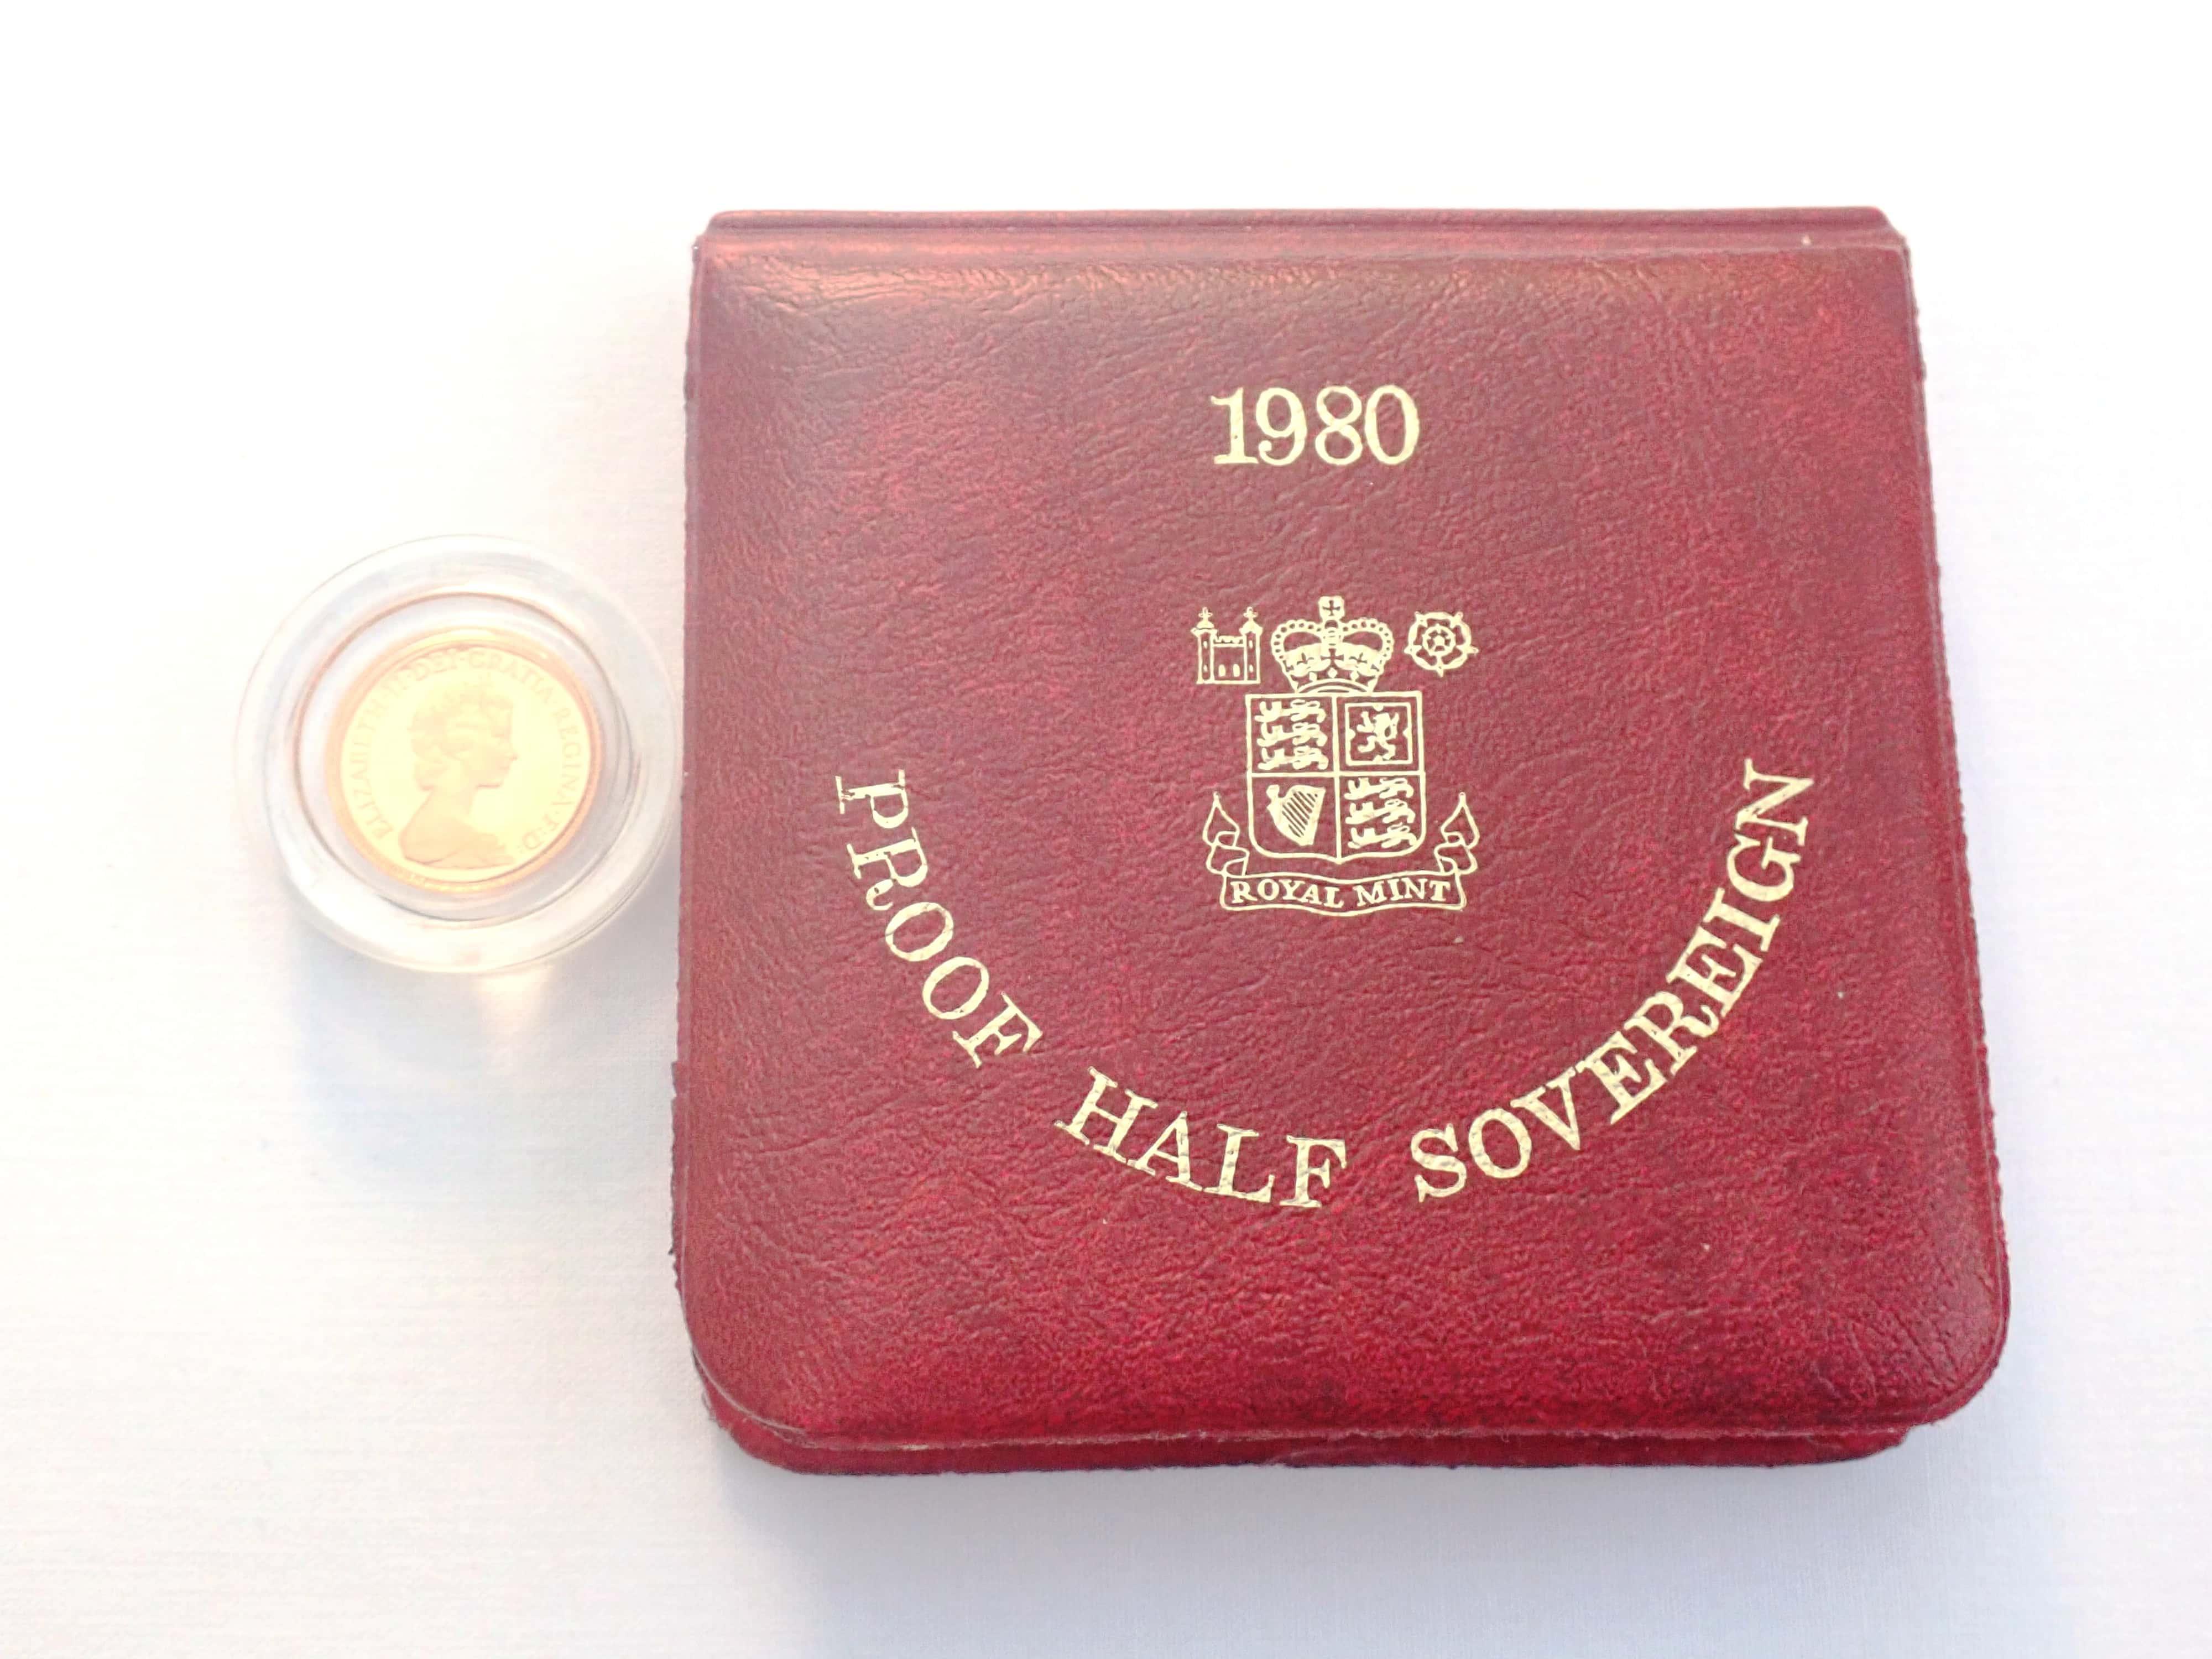 AA000702 - 1980 Proof Gold Half Sovereign Red Boxed 22k Elizabeth II 2nd Portrait #175